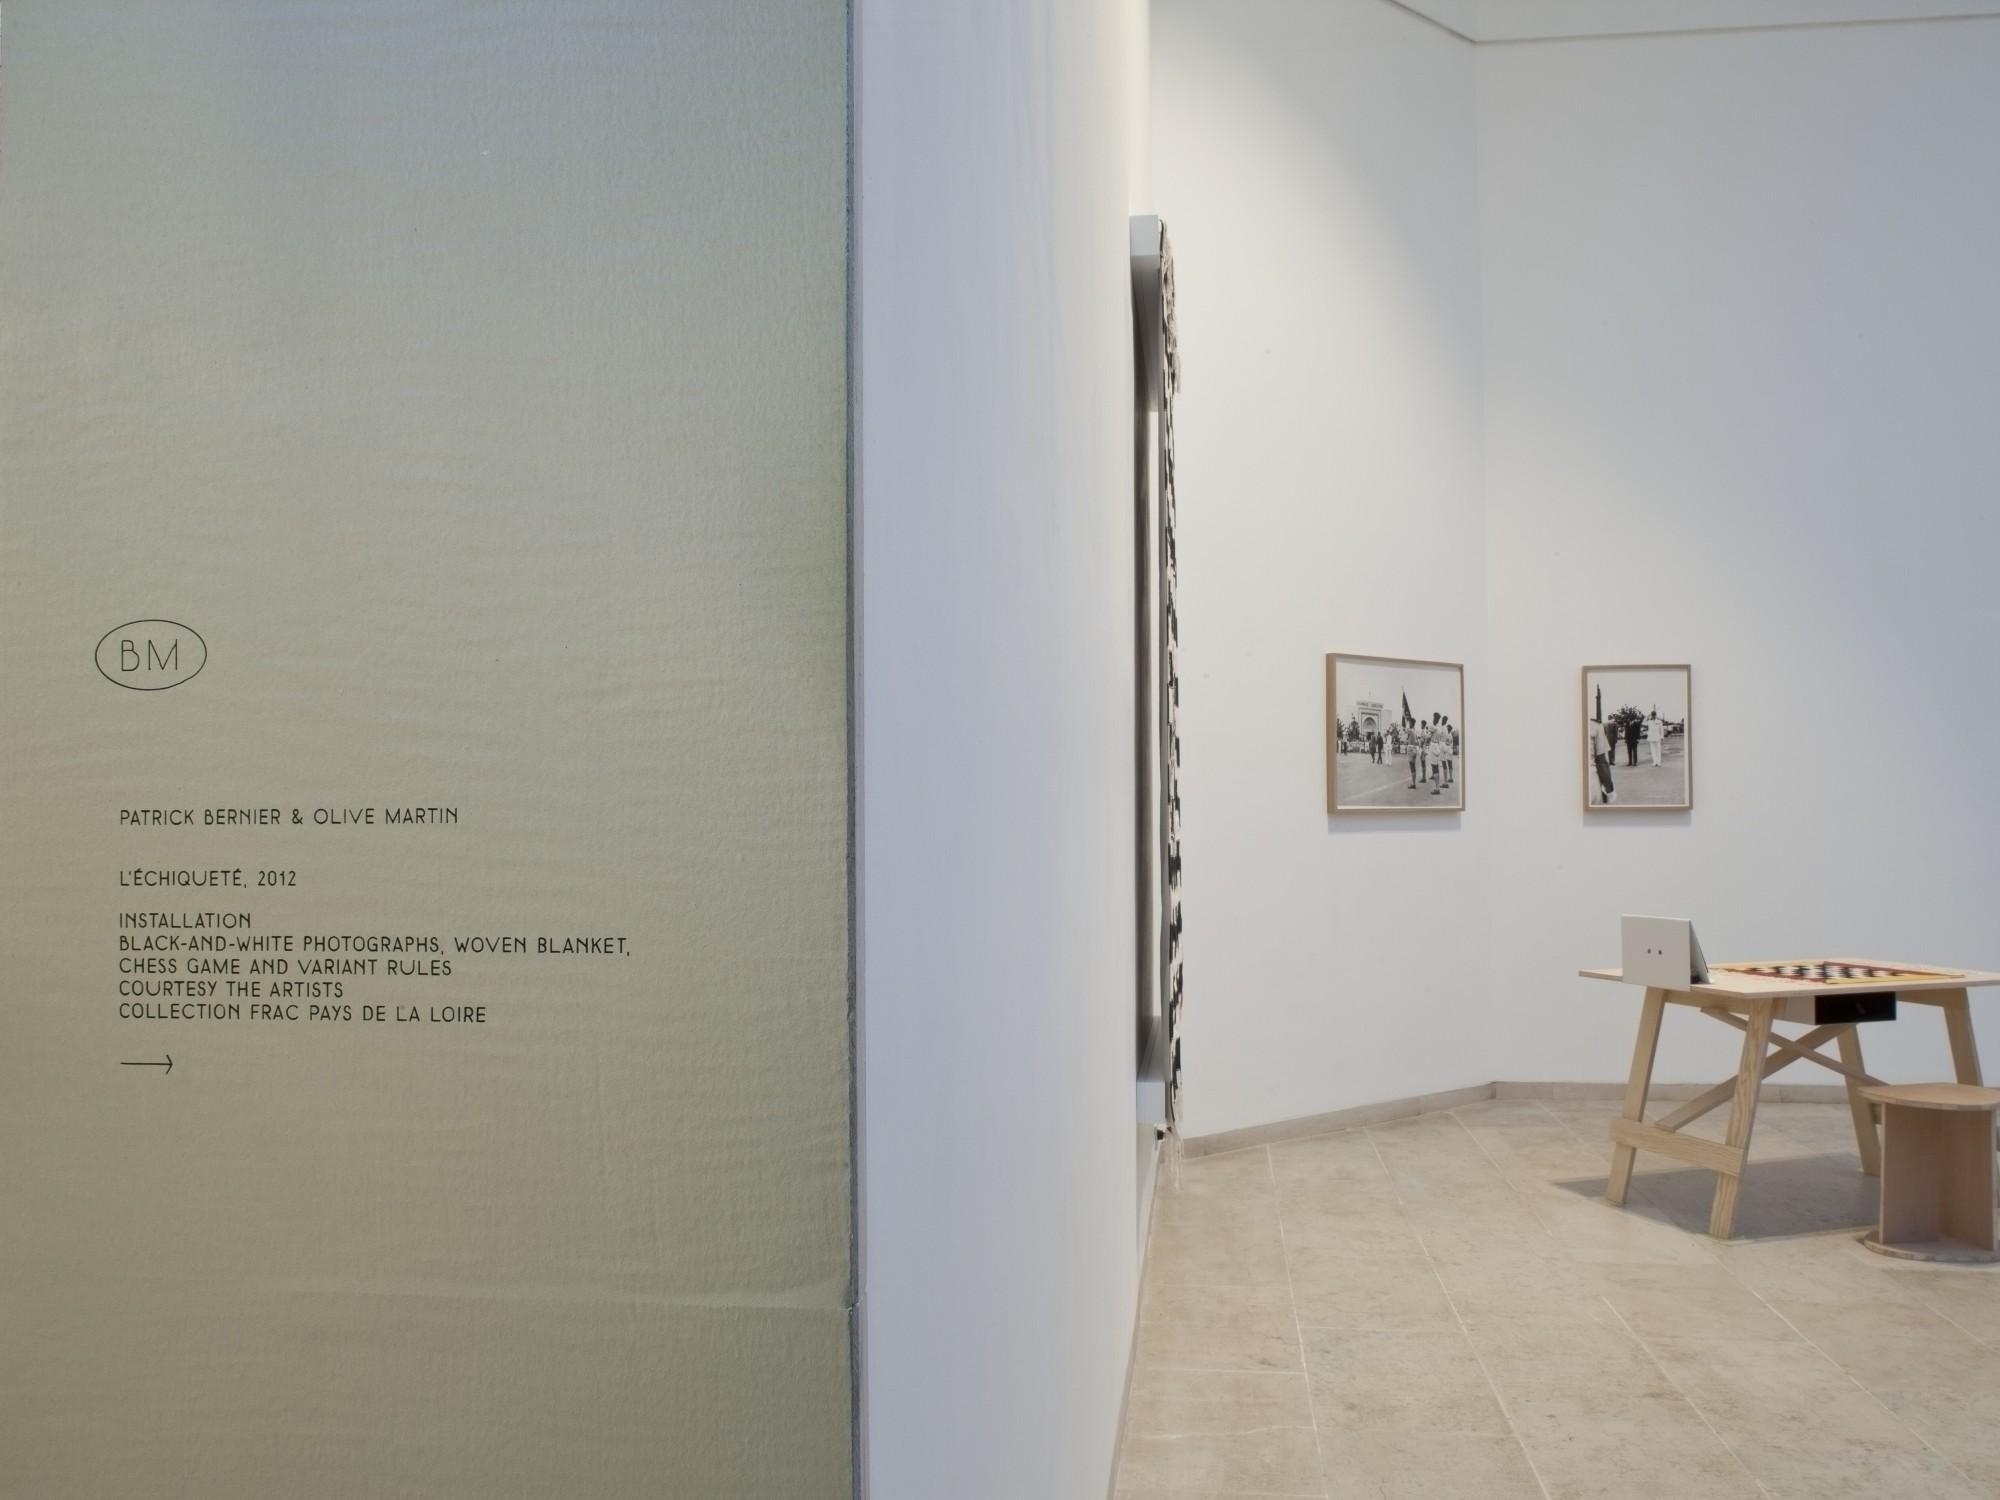 documentation/signage-belgian-pavilion/venice-patrick-olive.jpg